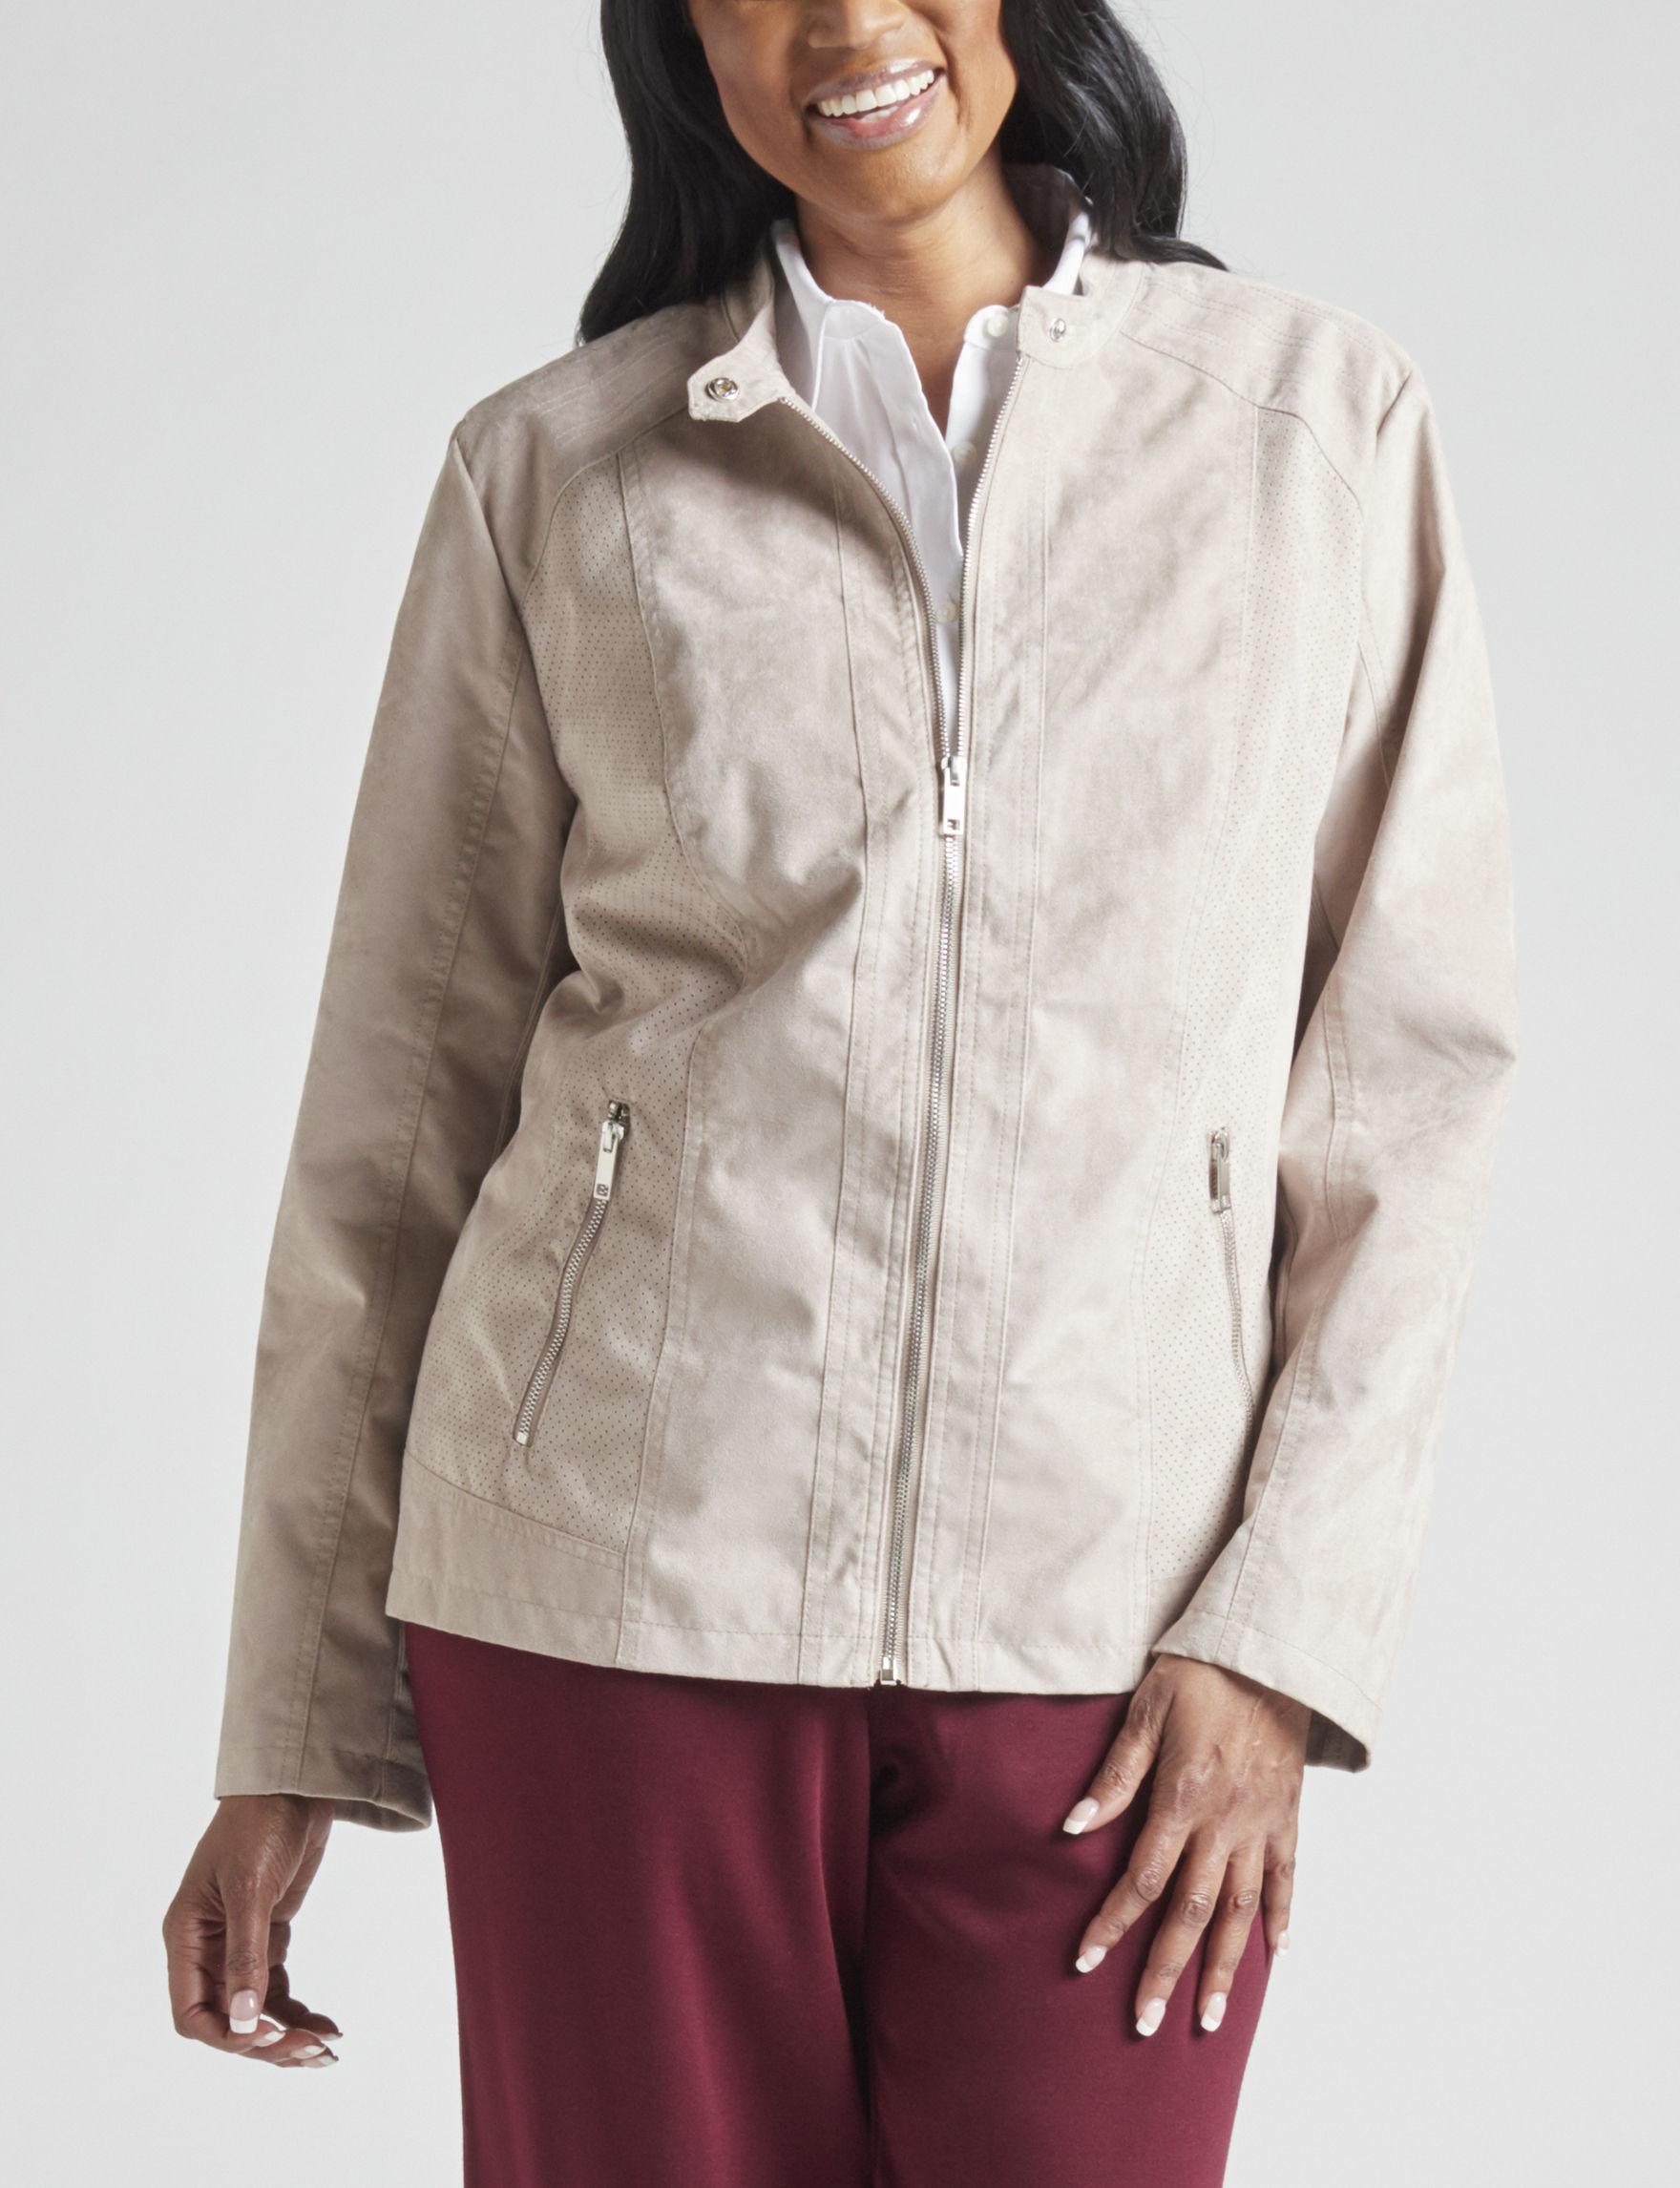 Valerie Stevens Taupe Lightweight Jackets & Blazers